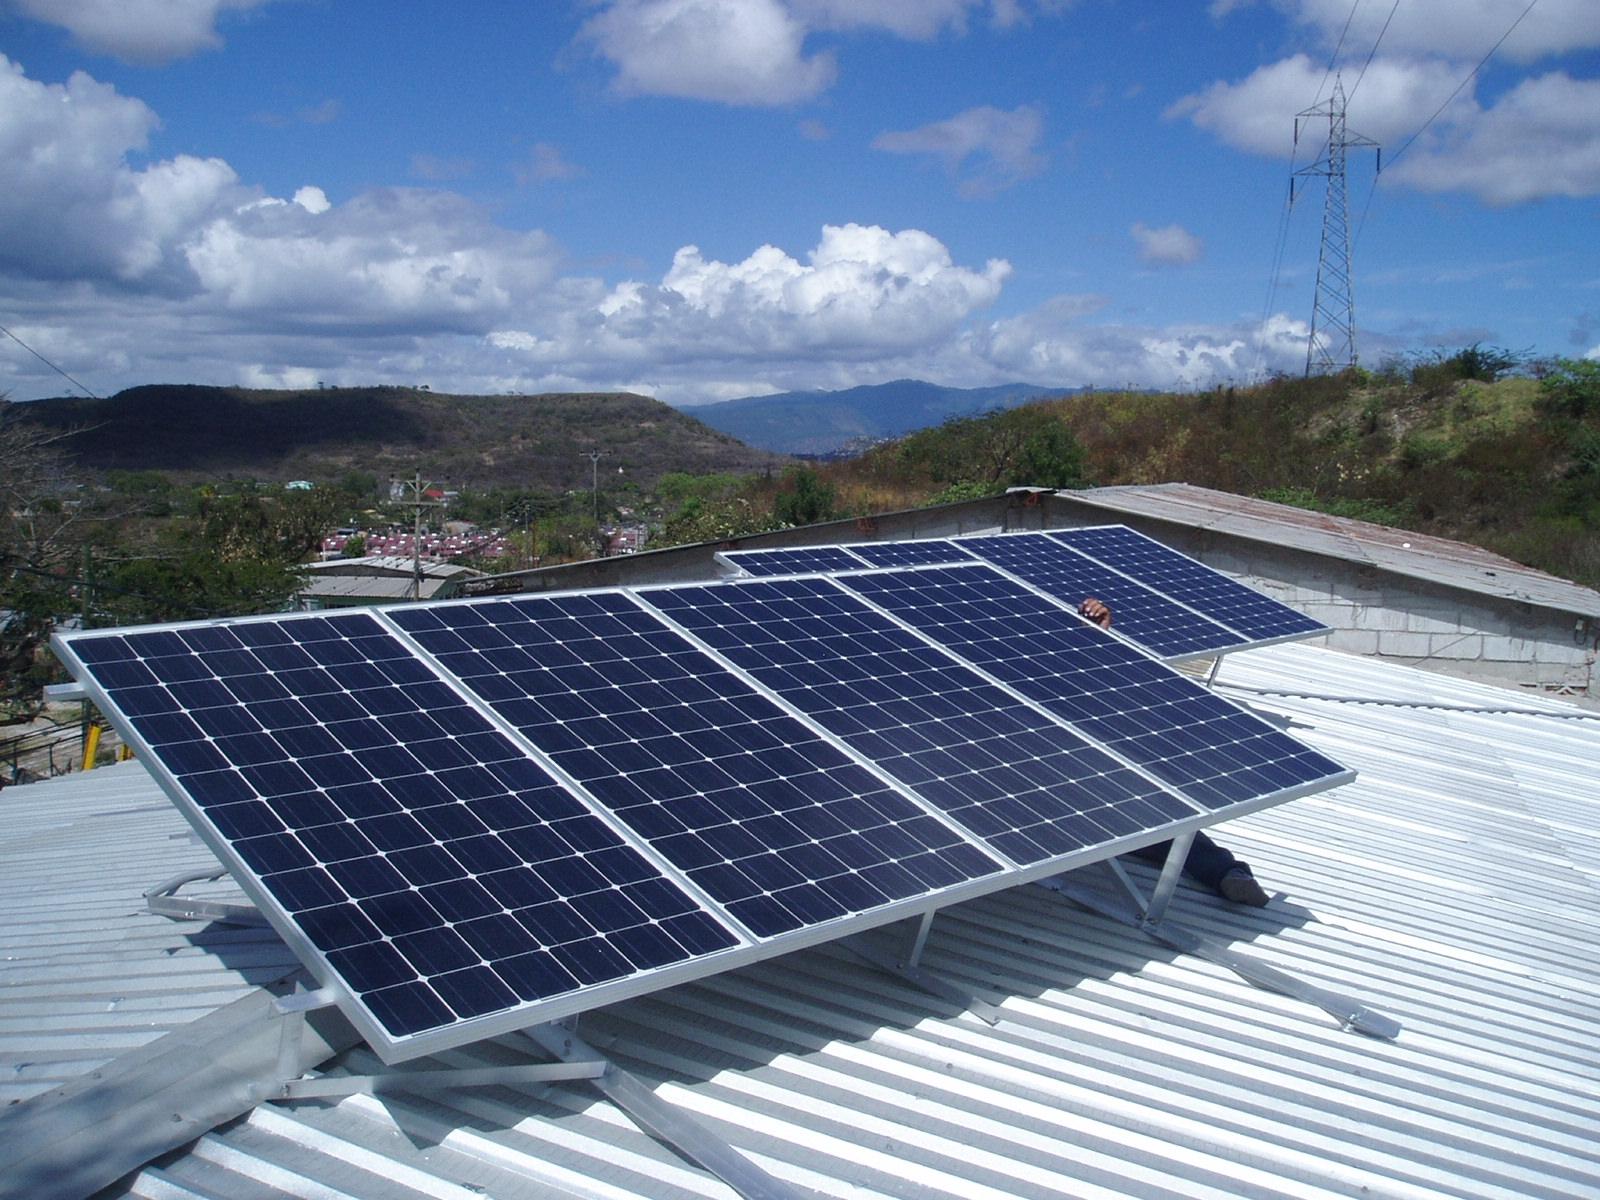 Solarpanil: Sustainable Development